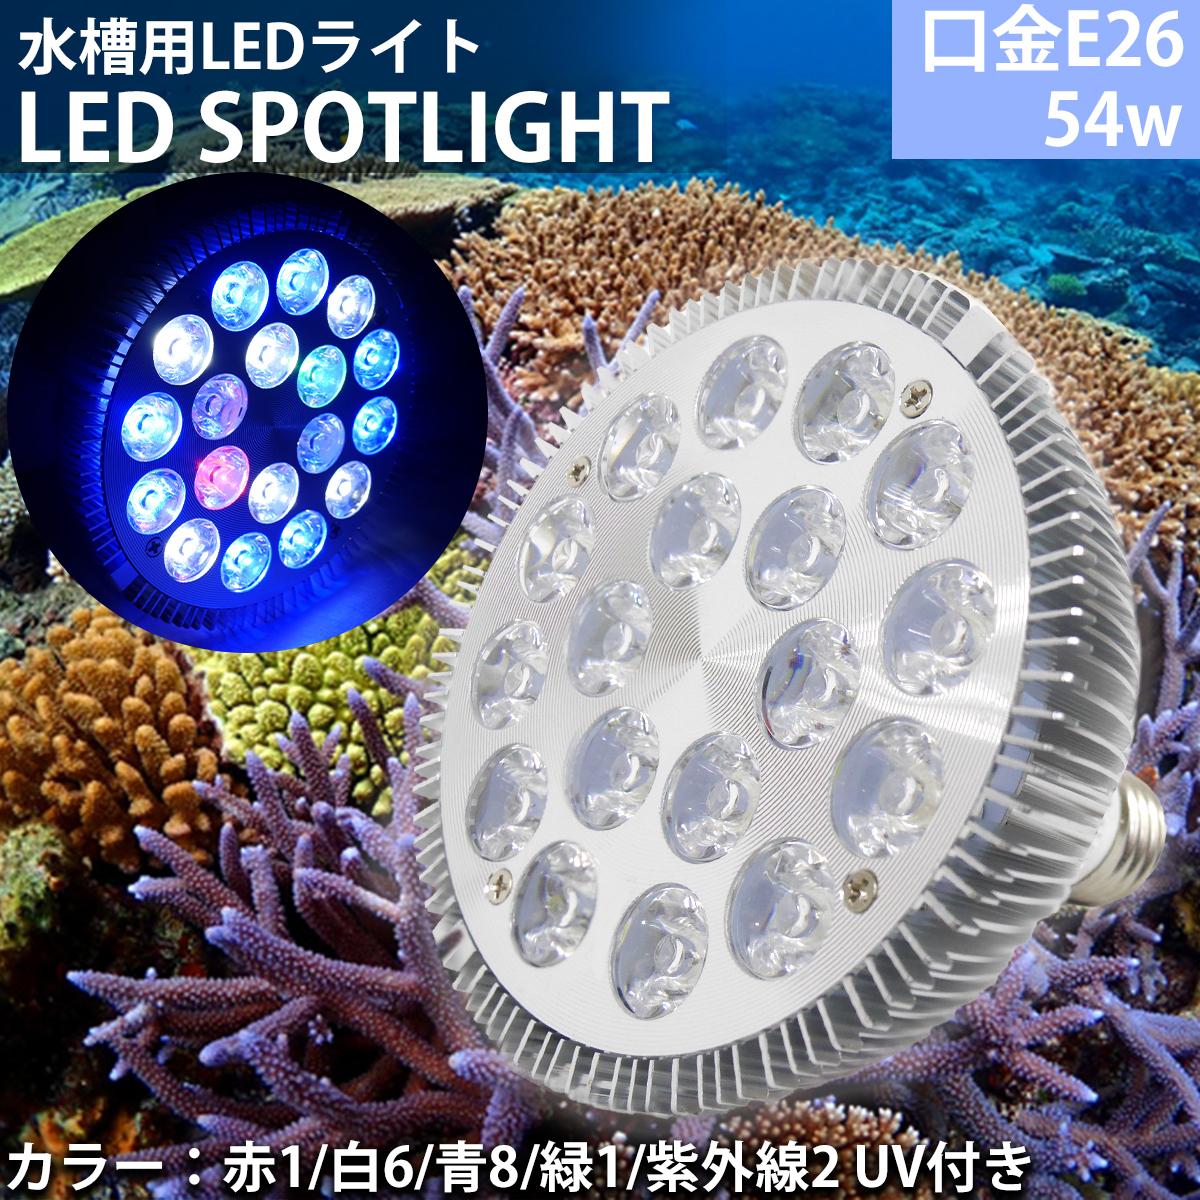 E26口金 54W 珊瑚 植物育成 水草用 水槽用 熱帯魚 LEDアクアリウムスポットライト 赤1/白6/青8/緑1/紫外線2 UV付き 【QL-14SL】_画像1